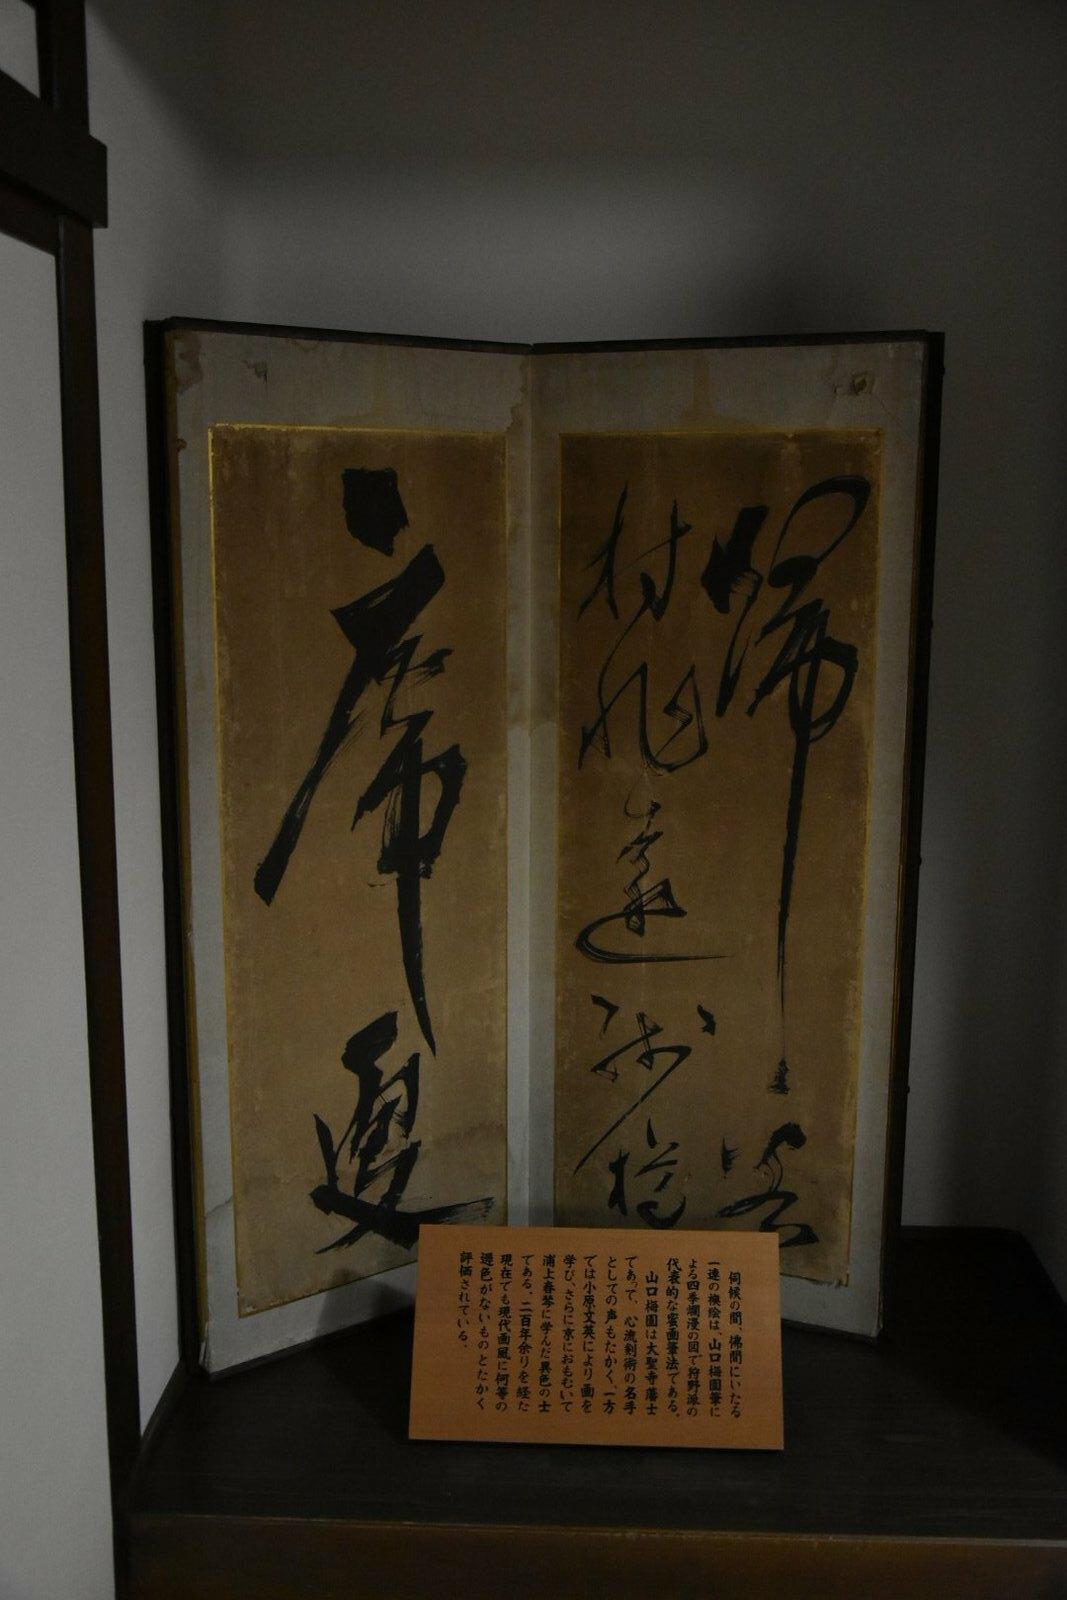 Kanazawa - Maison du clan Nomura